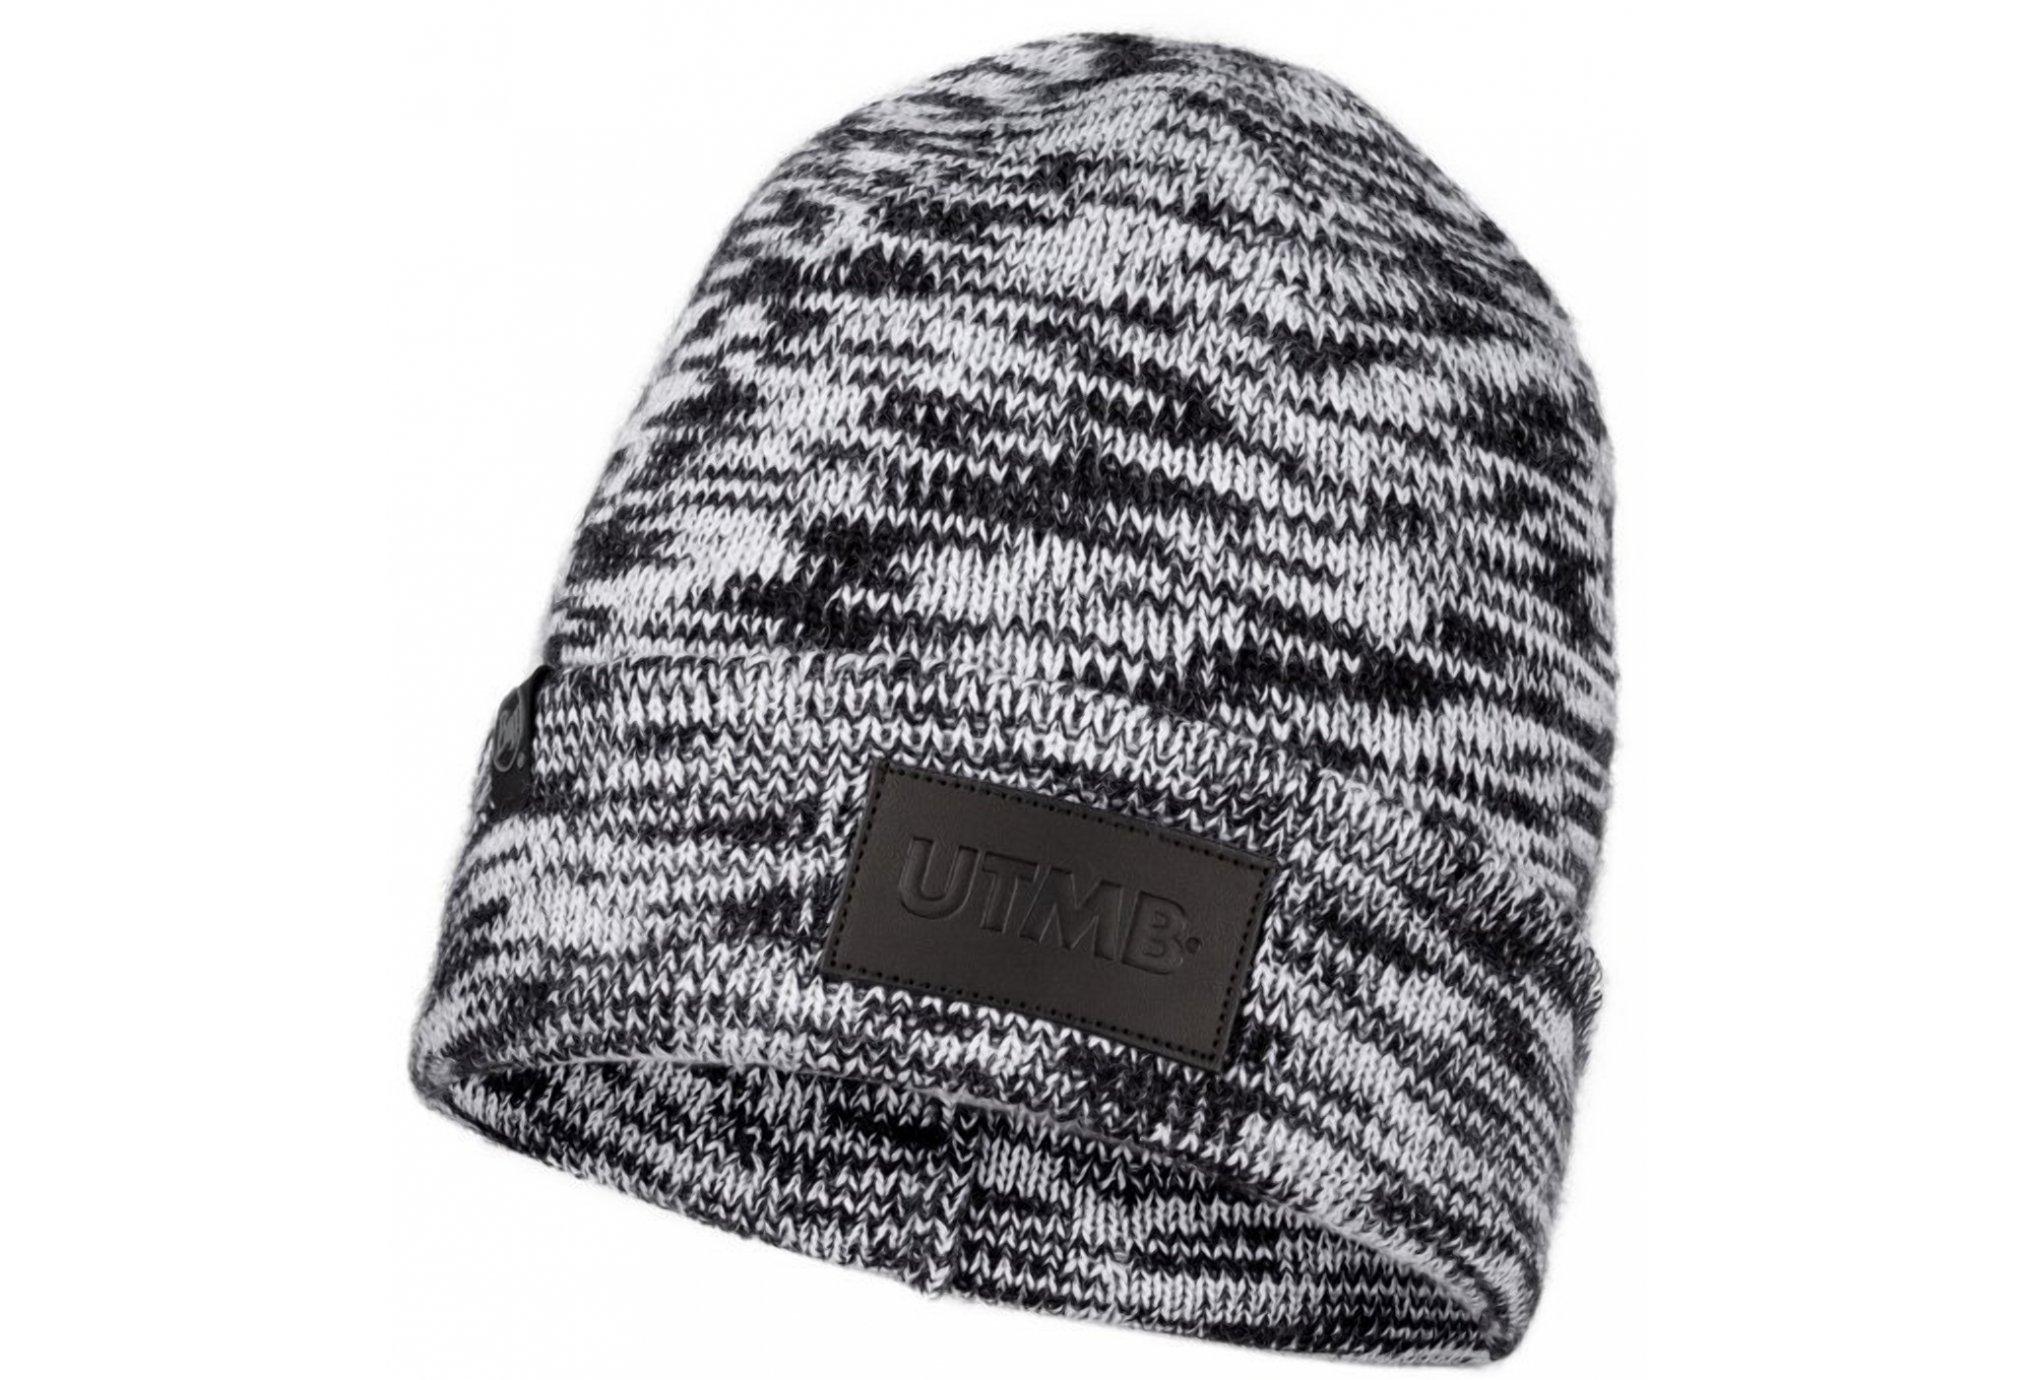 Buff Knitted UTMB Bonnets / Gants